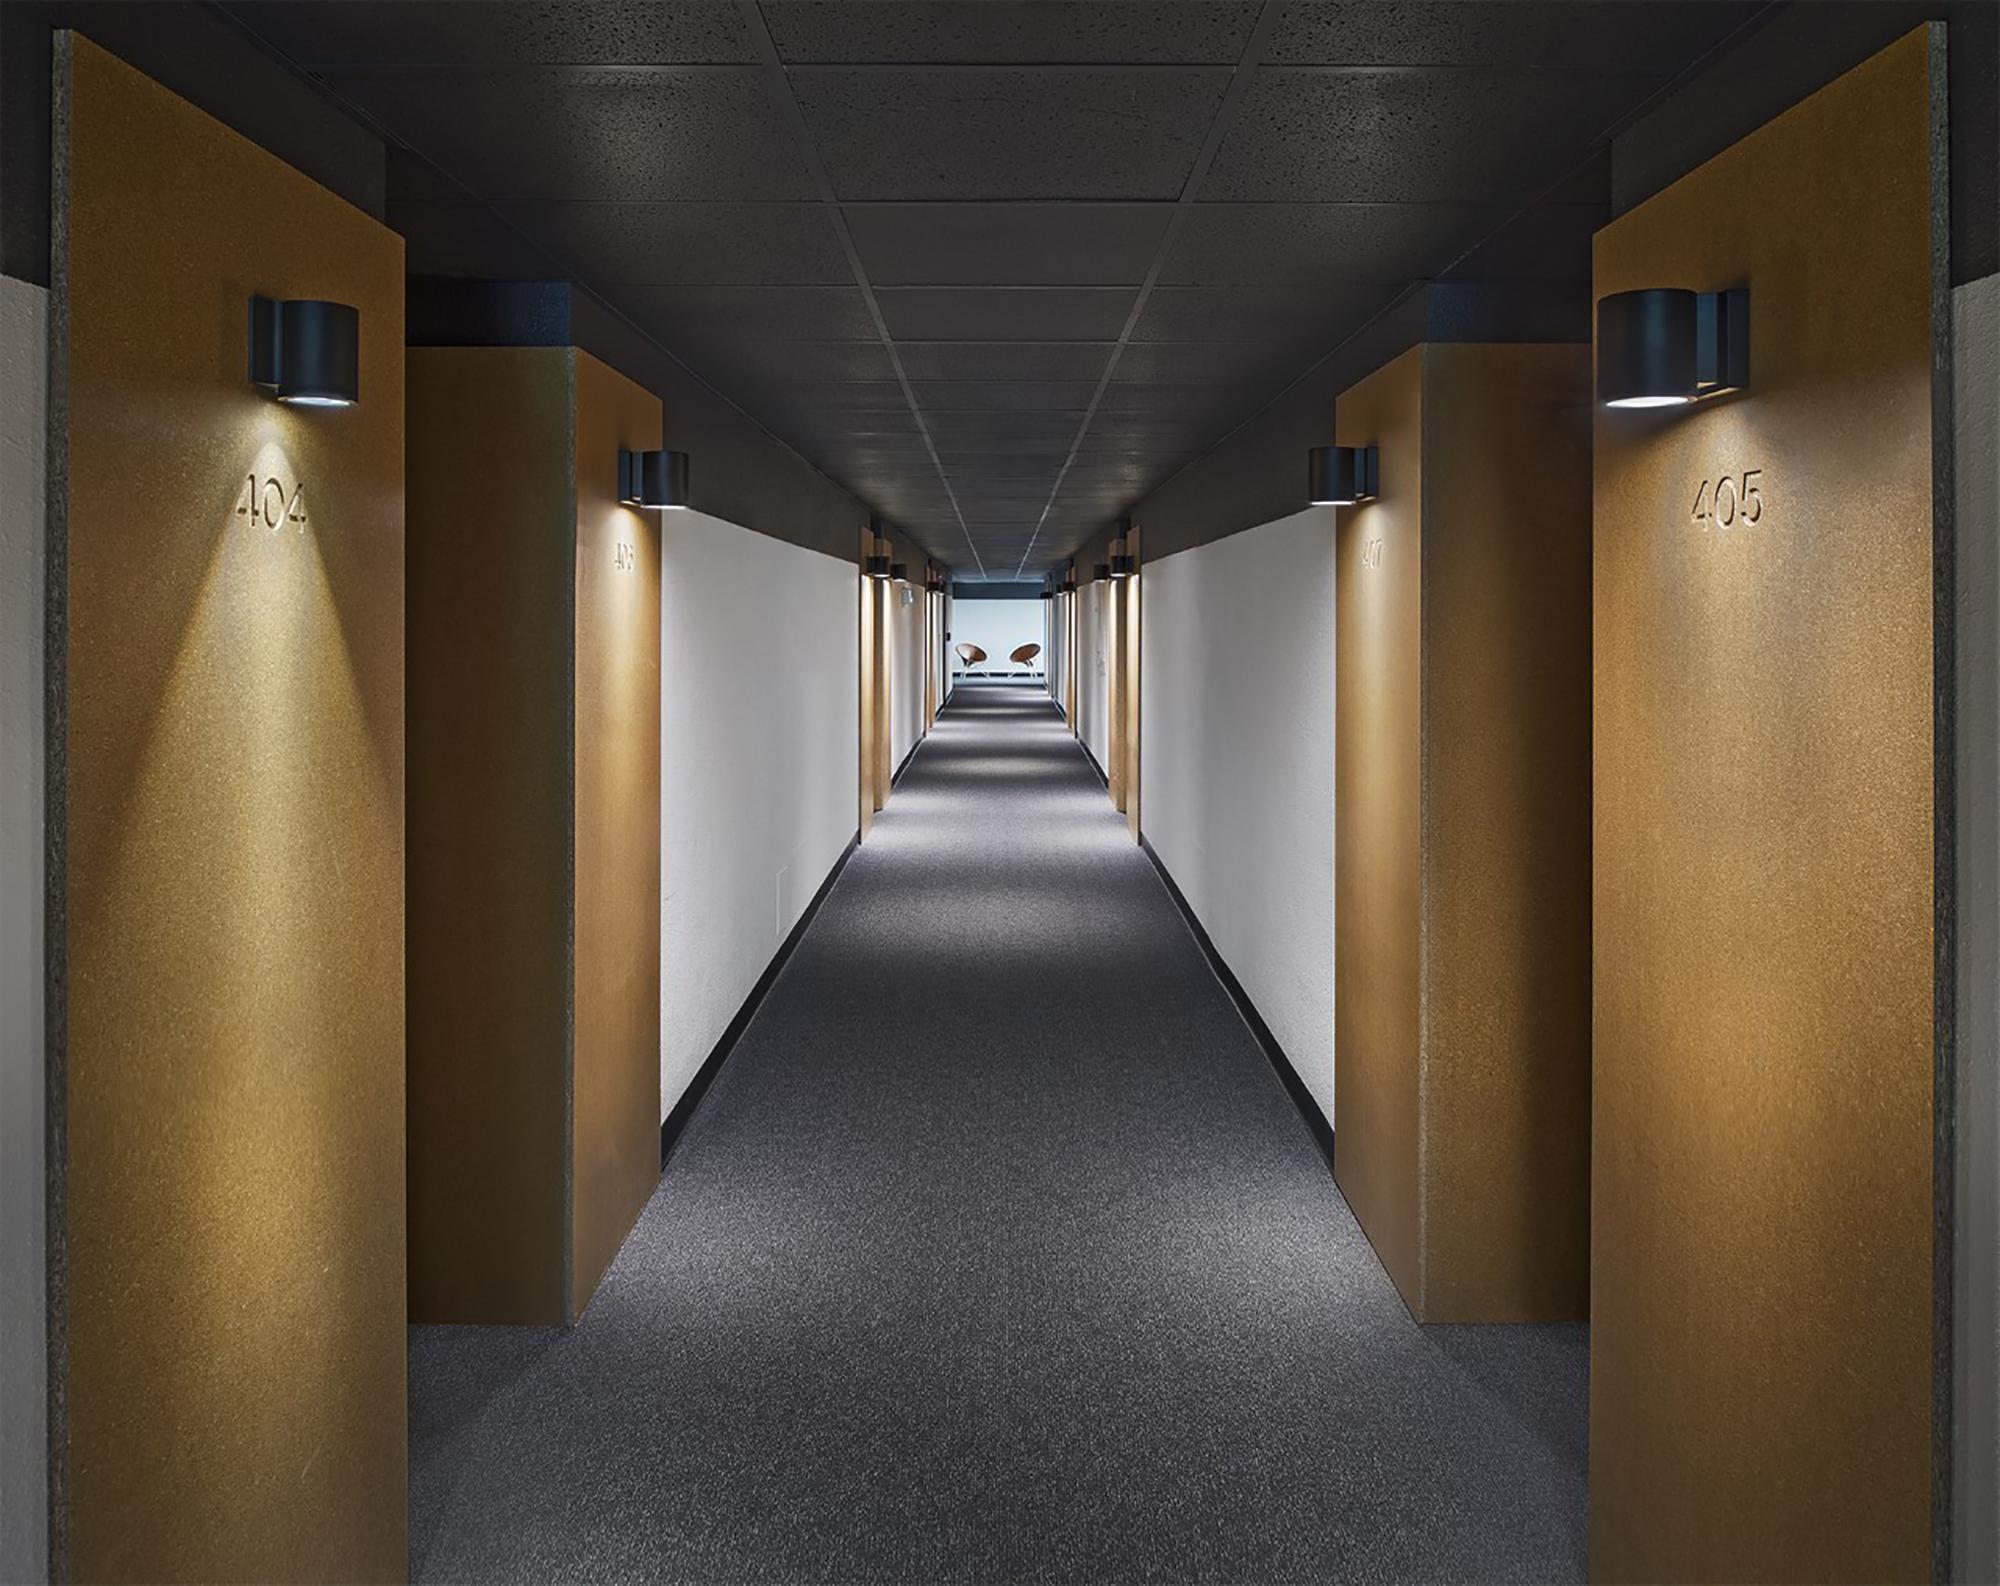 0_Trumbull and Porter Hotel Detroit Hallway to Rooms Photographer John D'Angelo.jpg